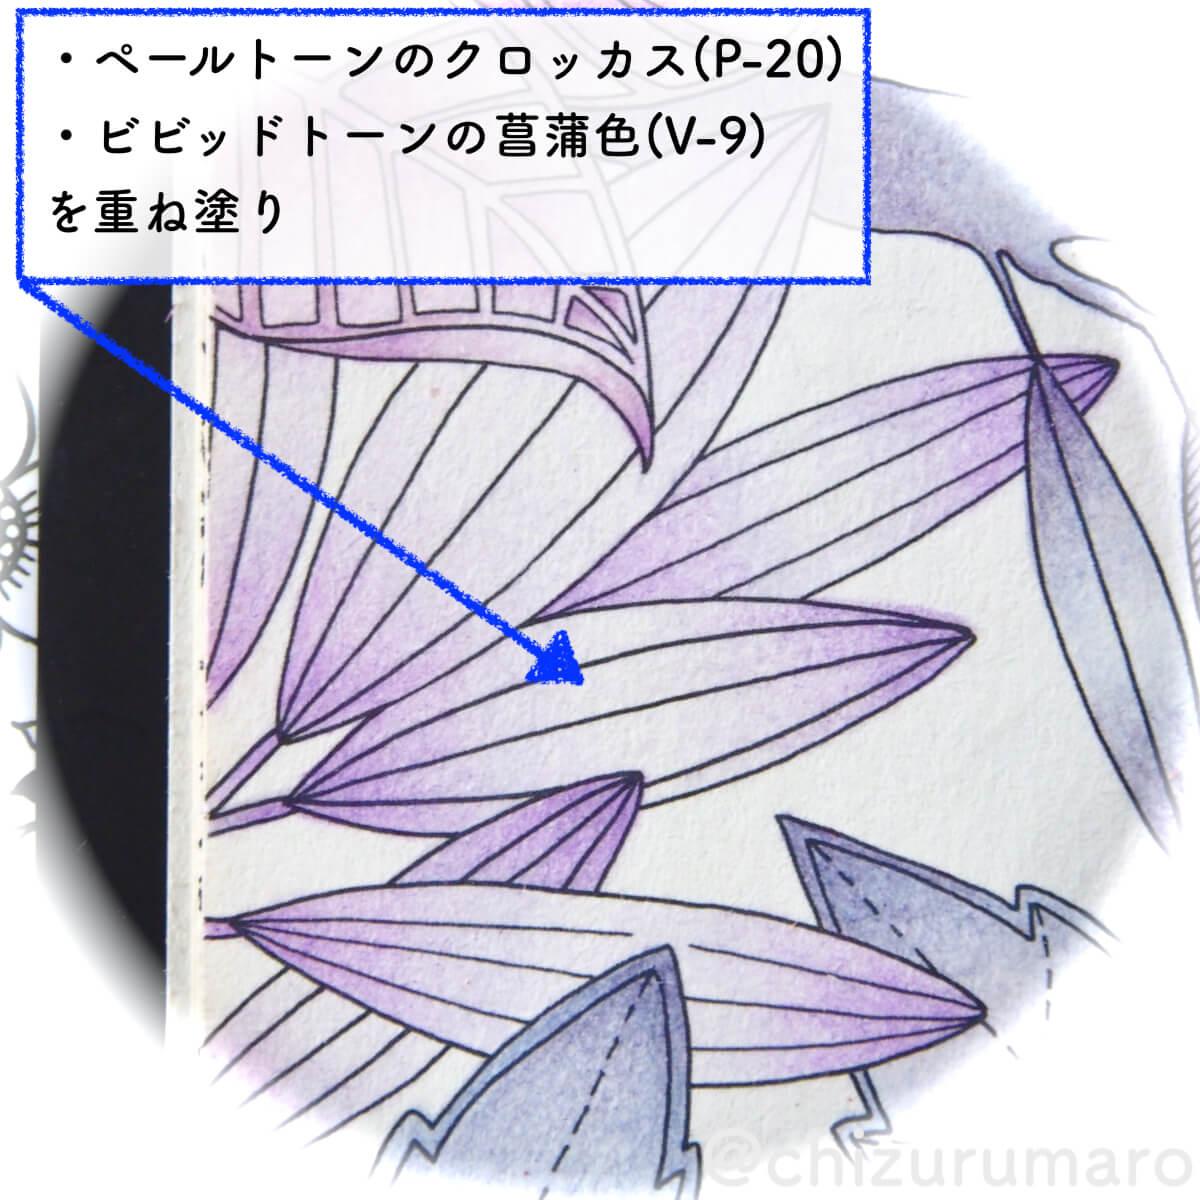 f:id:chizurumaro:20200513140030j:plain